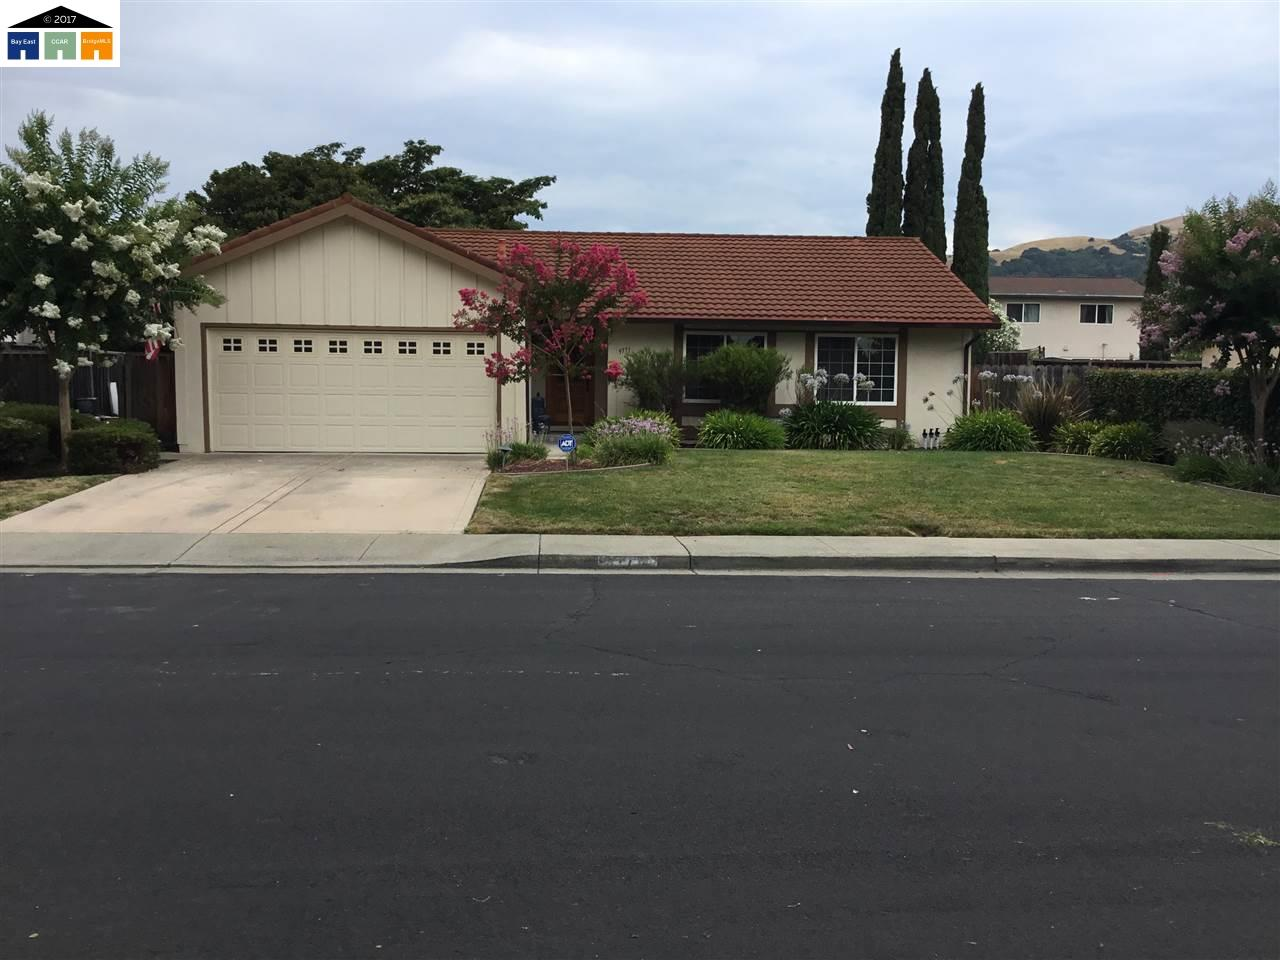 9771 gorham, SAN RAMON, CA 95843